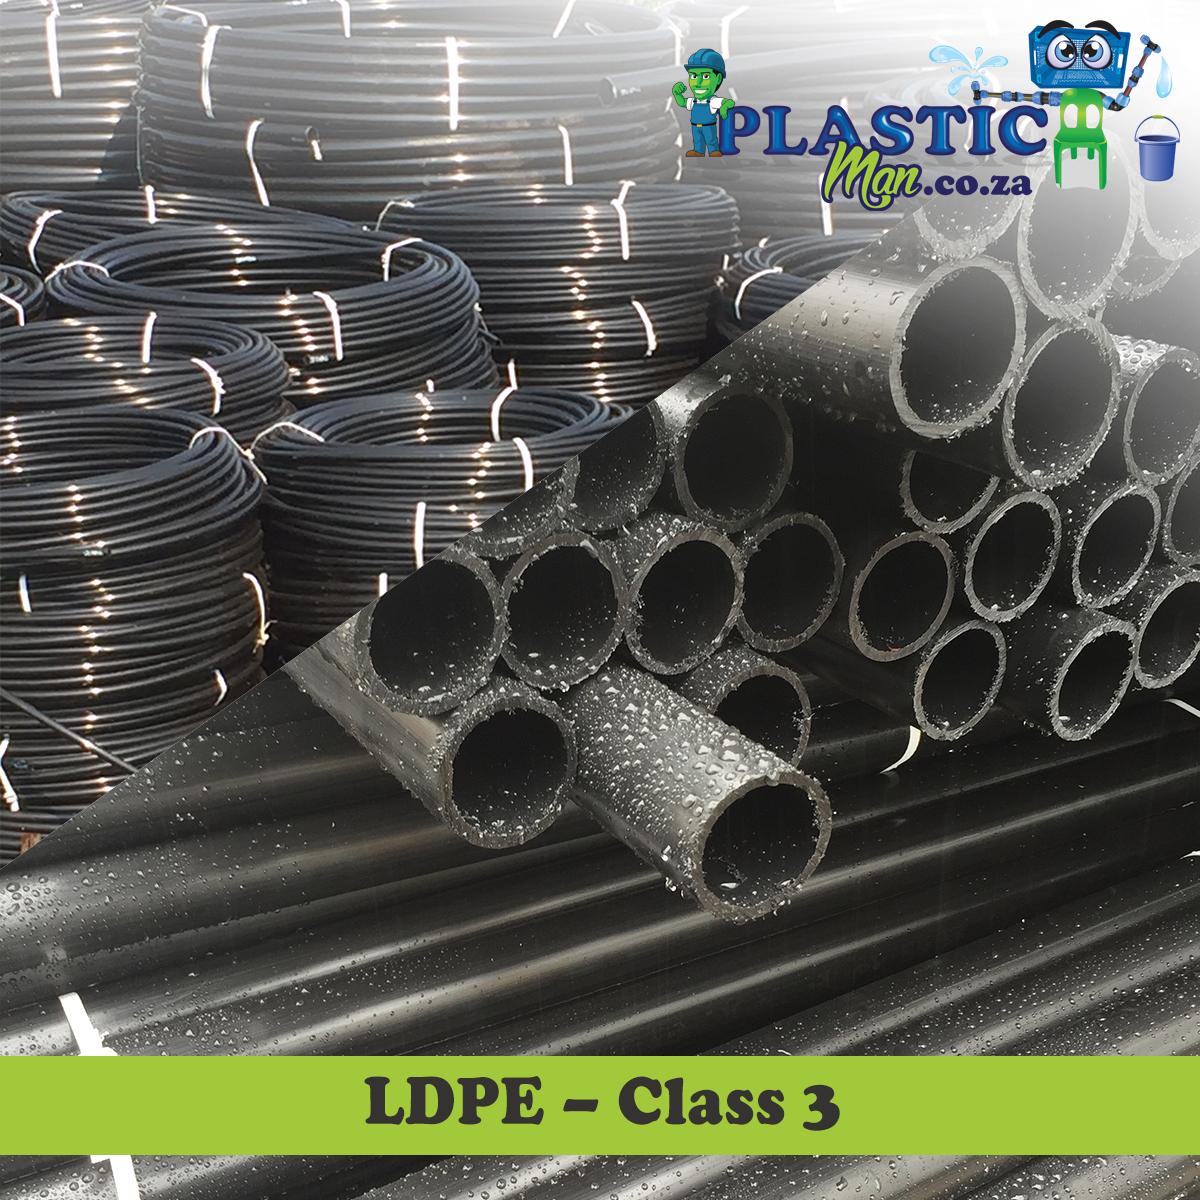 Plasticman LDPE Class 3 pipe